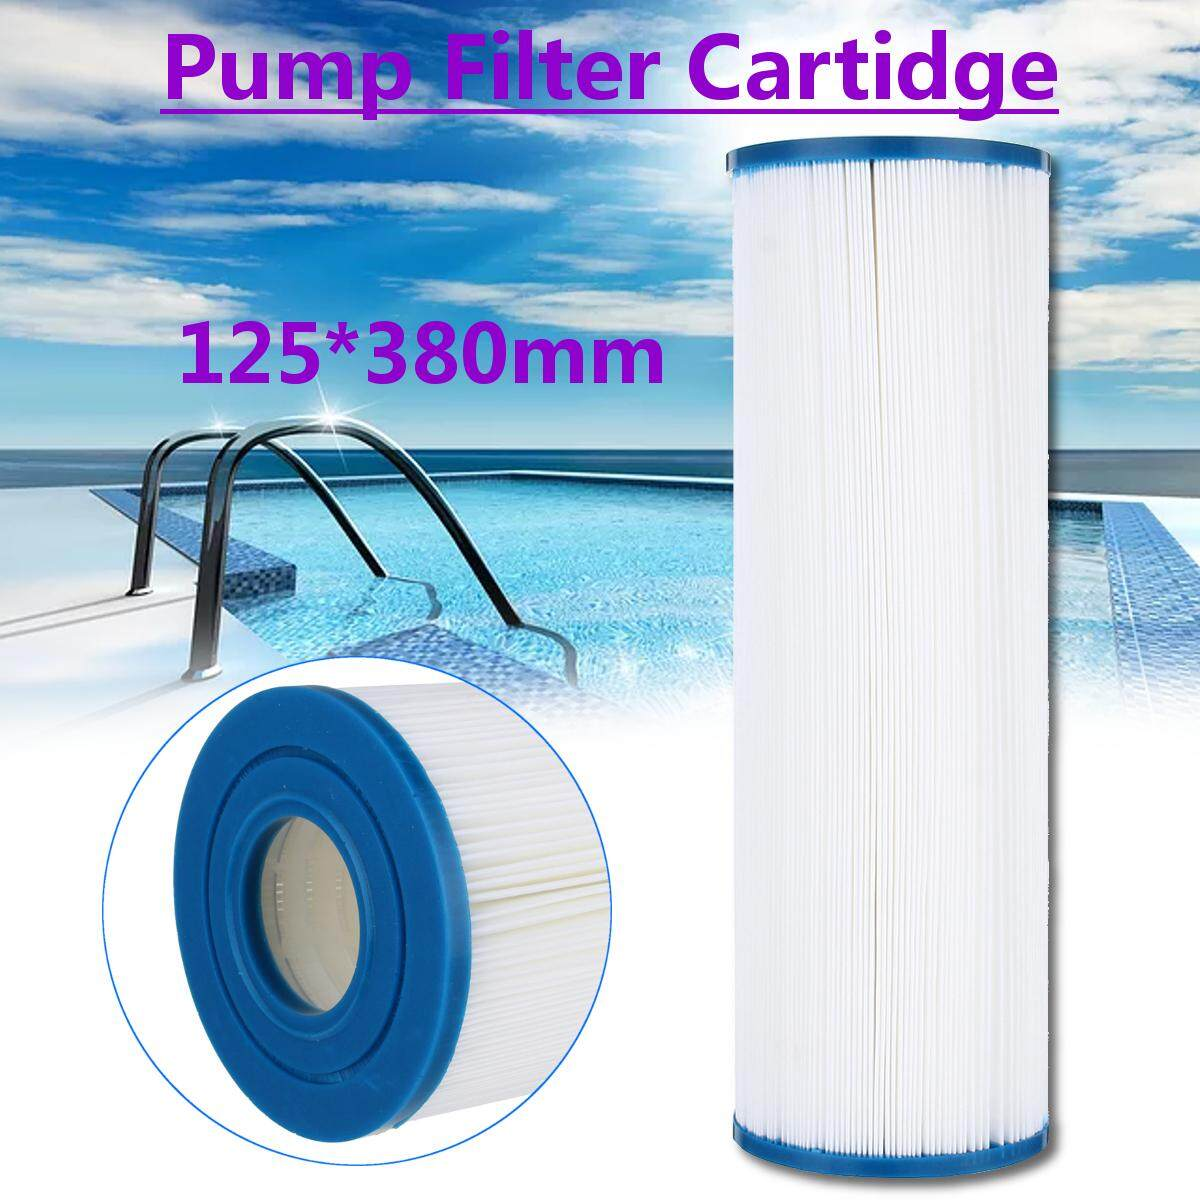 Swimming Pool Pump Replacement Filter Cartridge For Intex Filter Pumps KLDS100-85